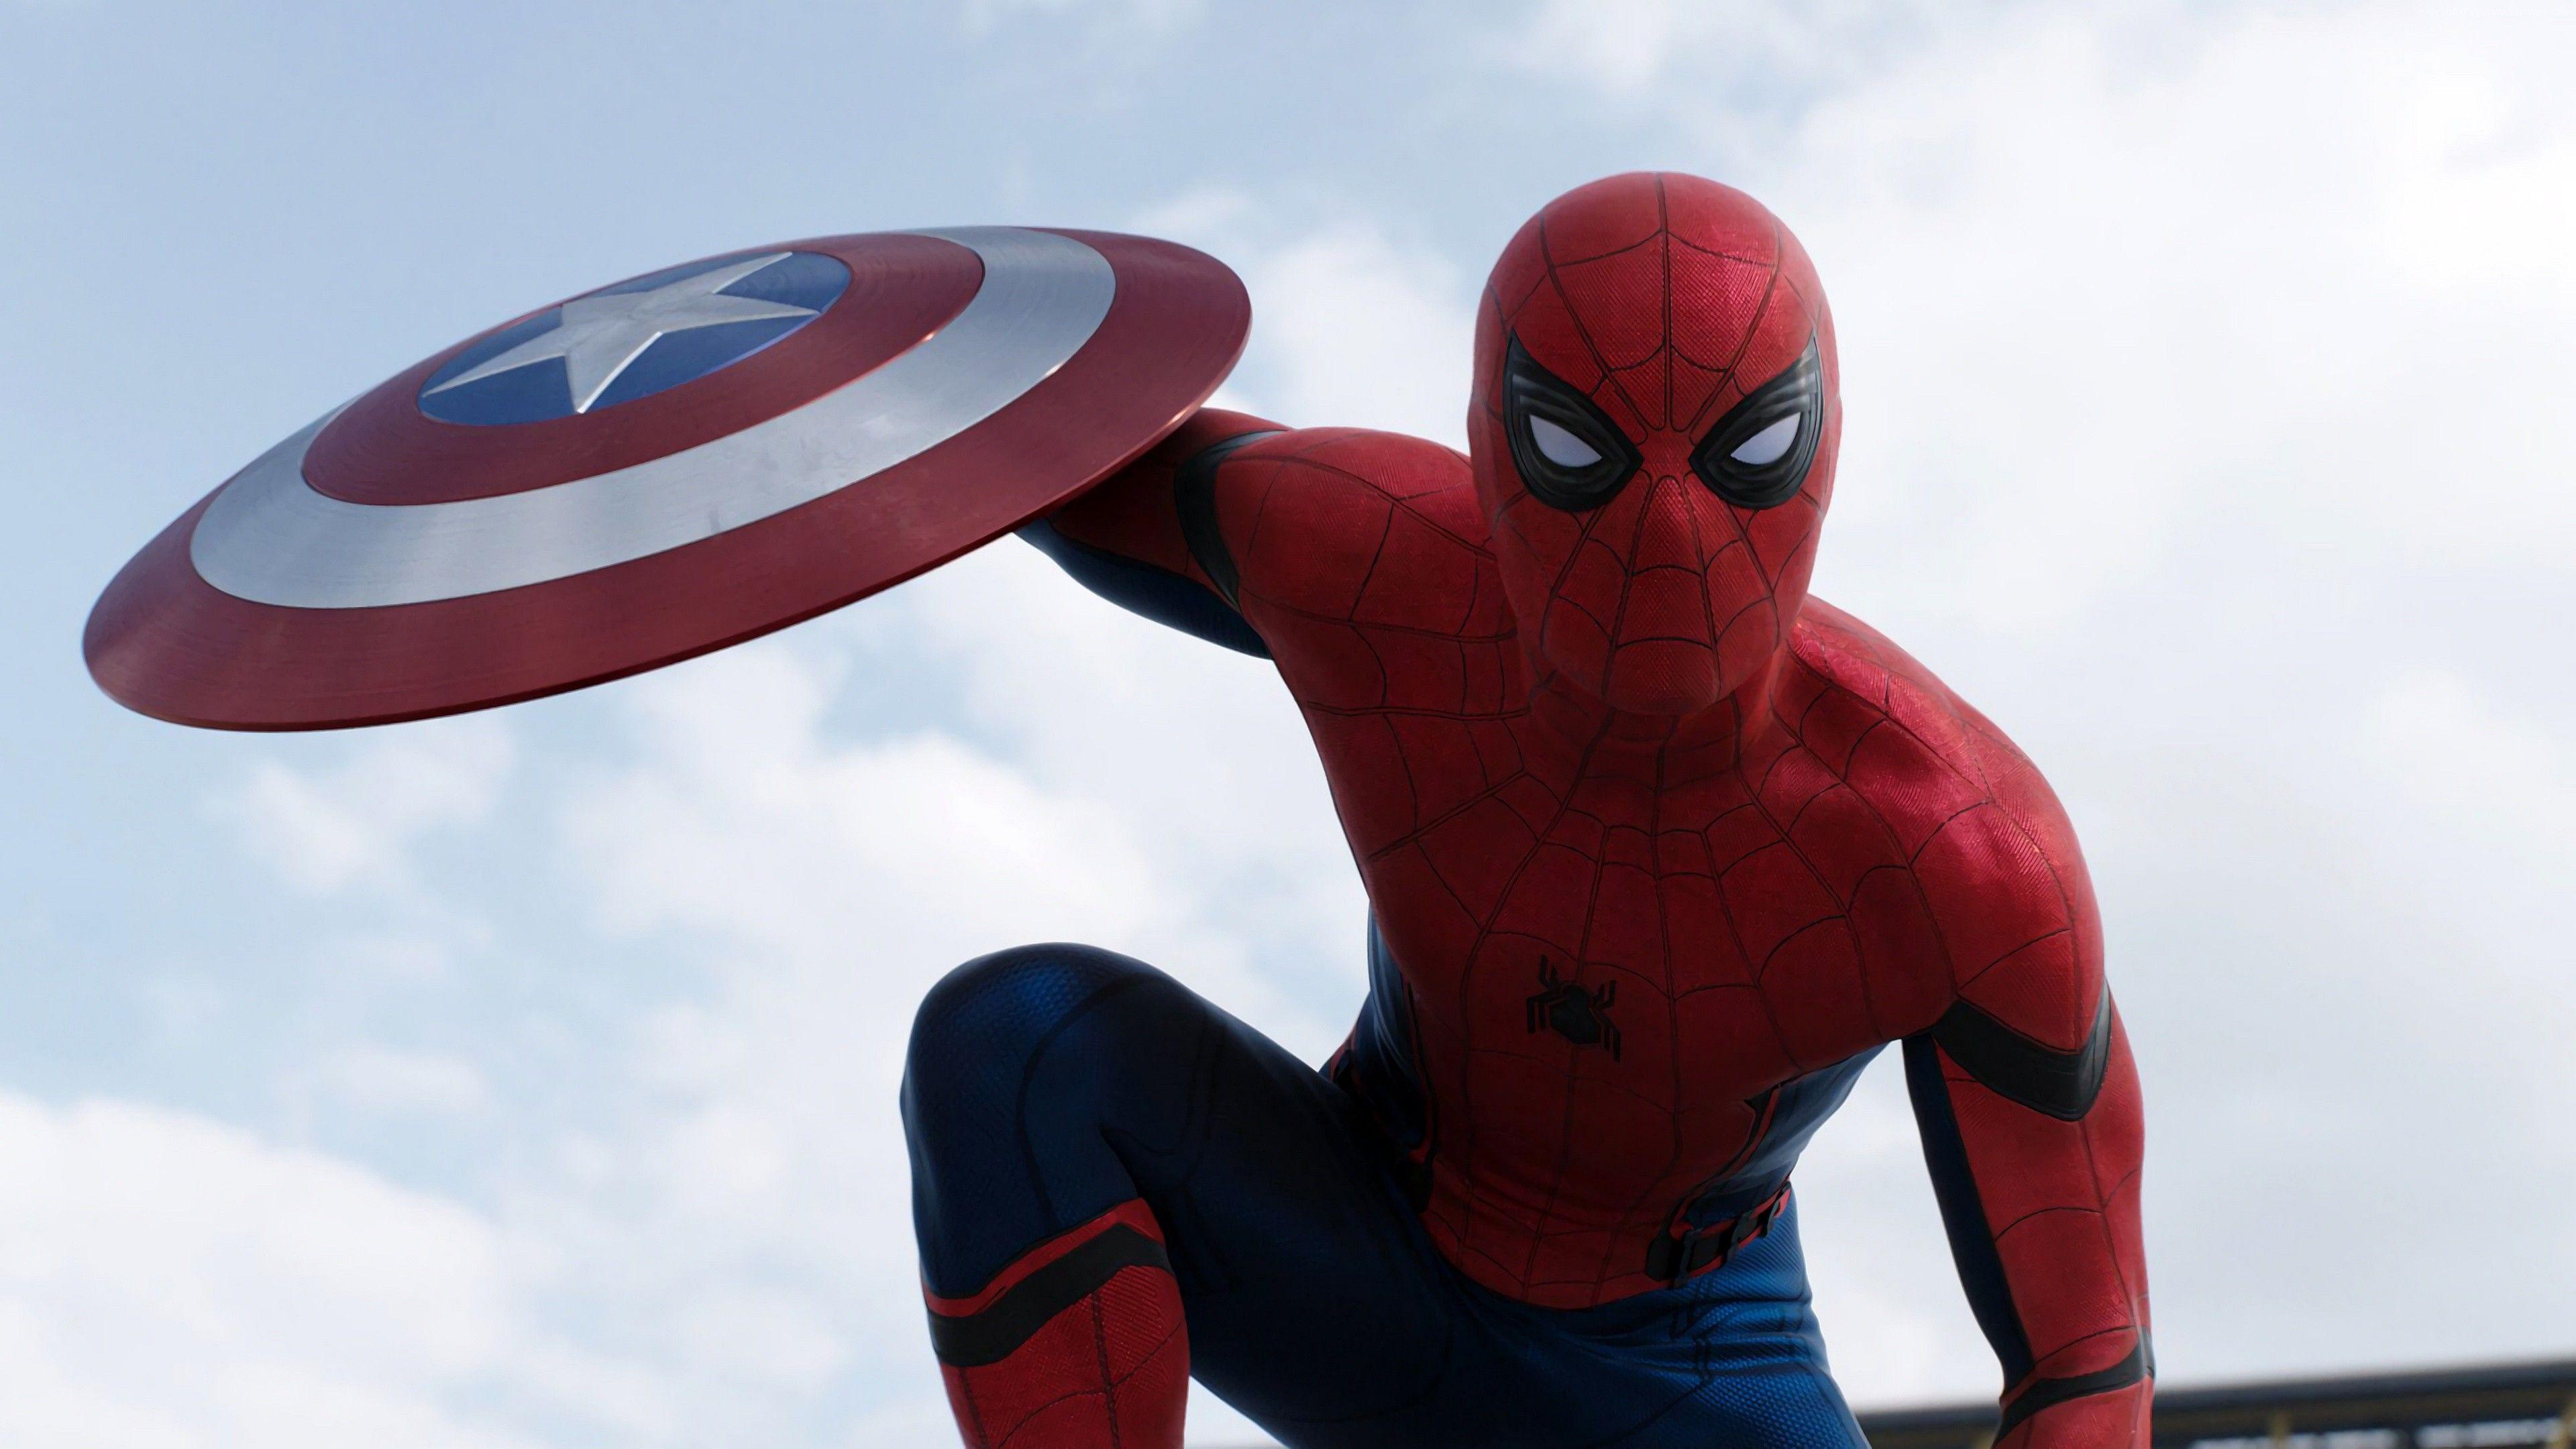 Spider Man Civil War Wallpapers   Top Spider Man Civil War 3840x2160